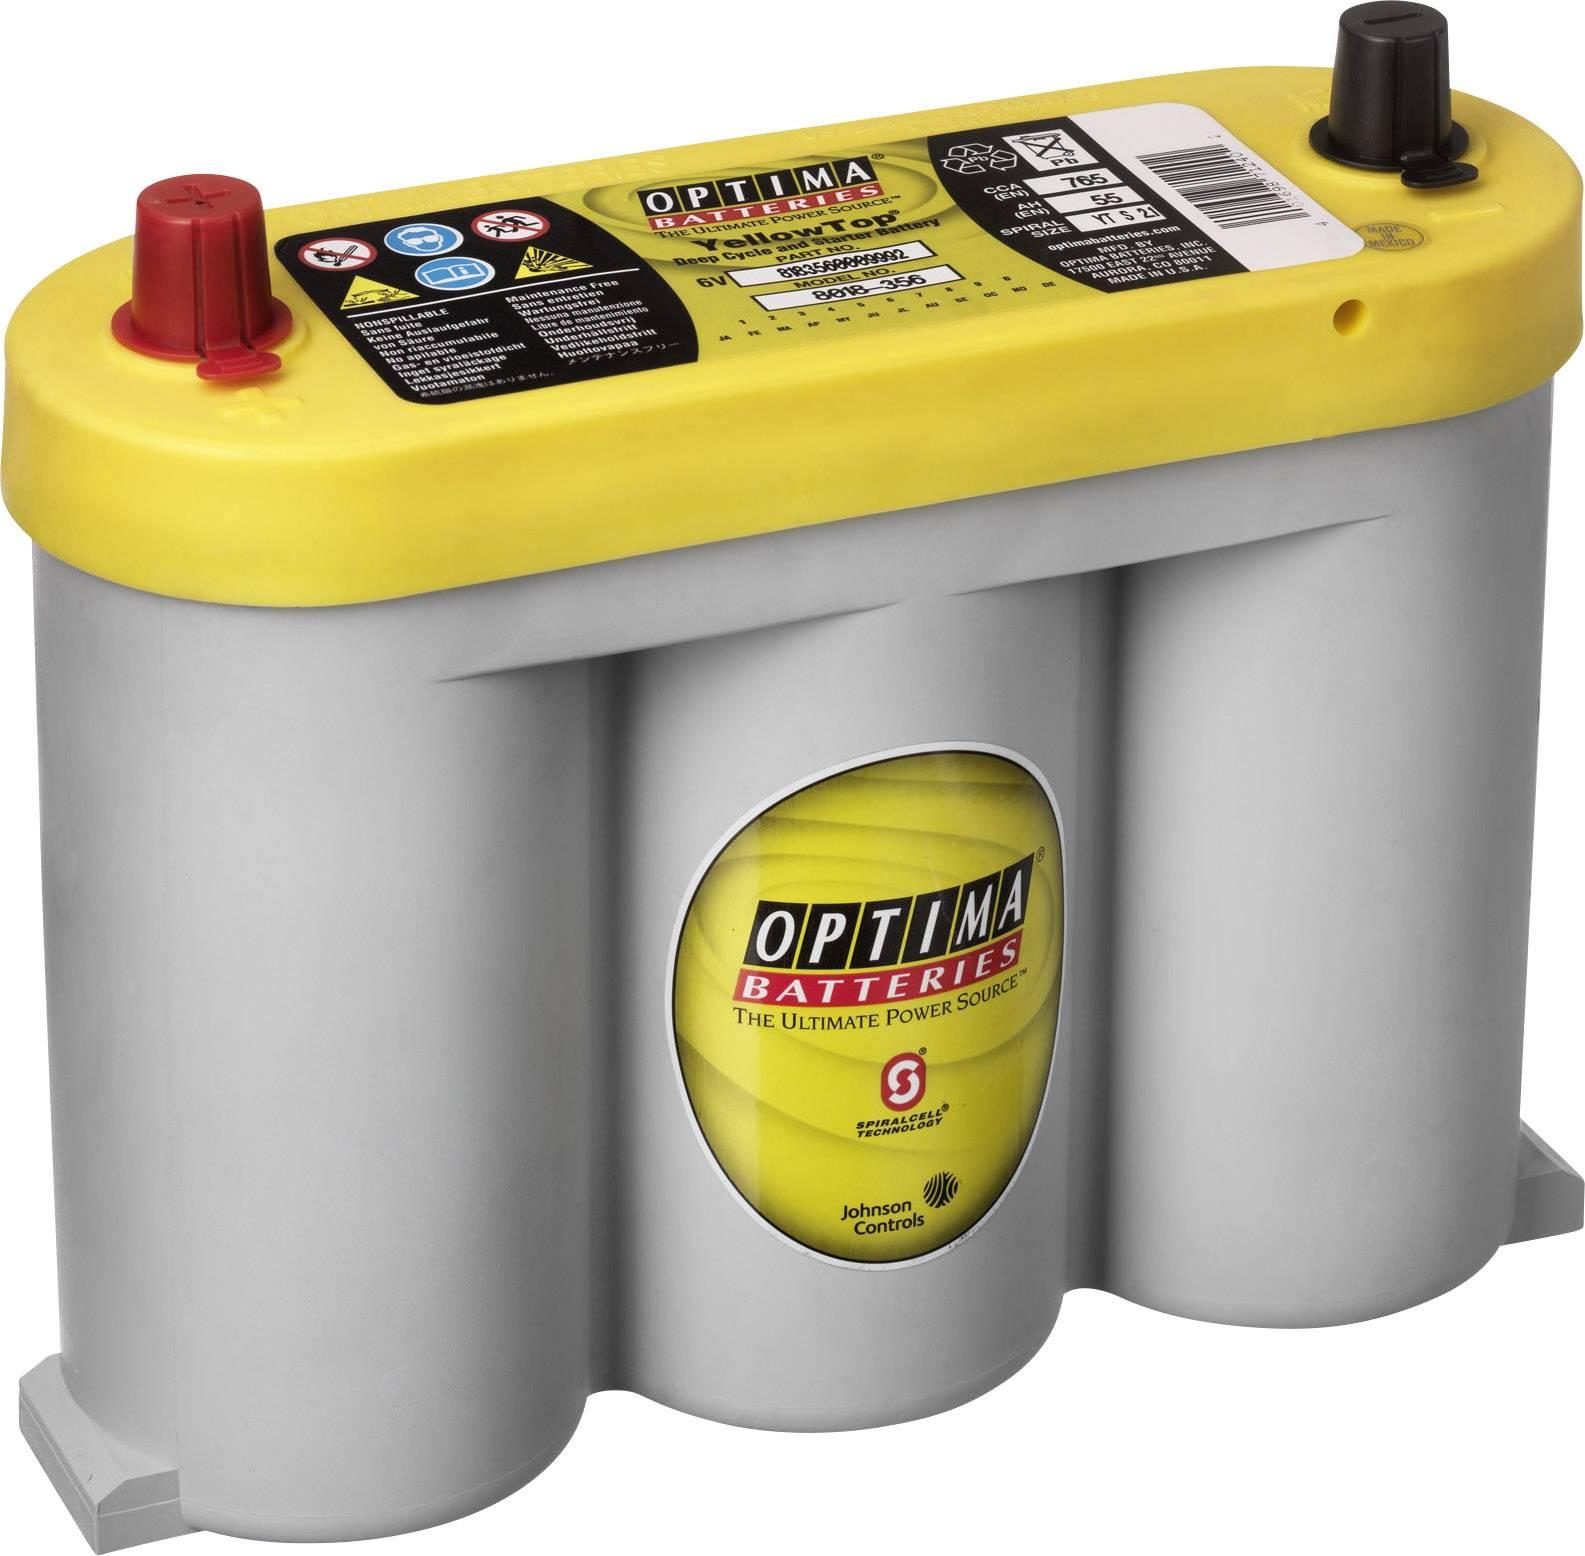 Optima Batteries YT S 2.1 818356000 8882 Bleiakku 6 V 55 Ah Blei Vlies (AGM) (B x H x T) 255 x 206 x 90 mm Konuspol Wart